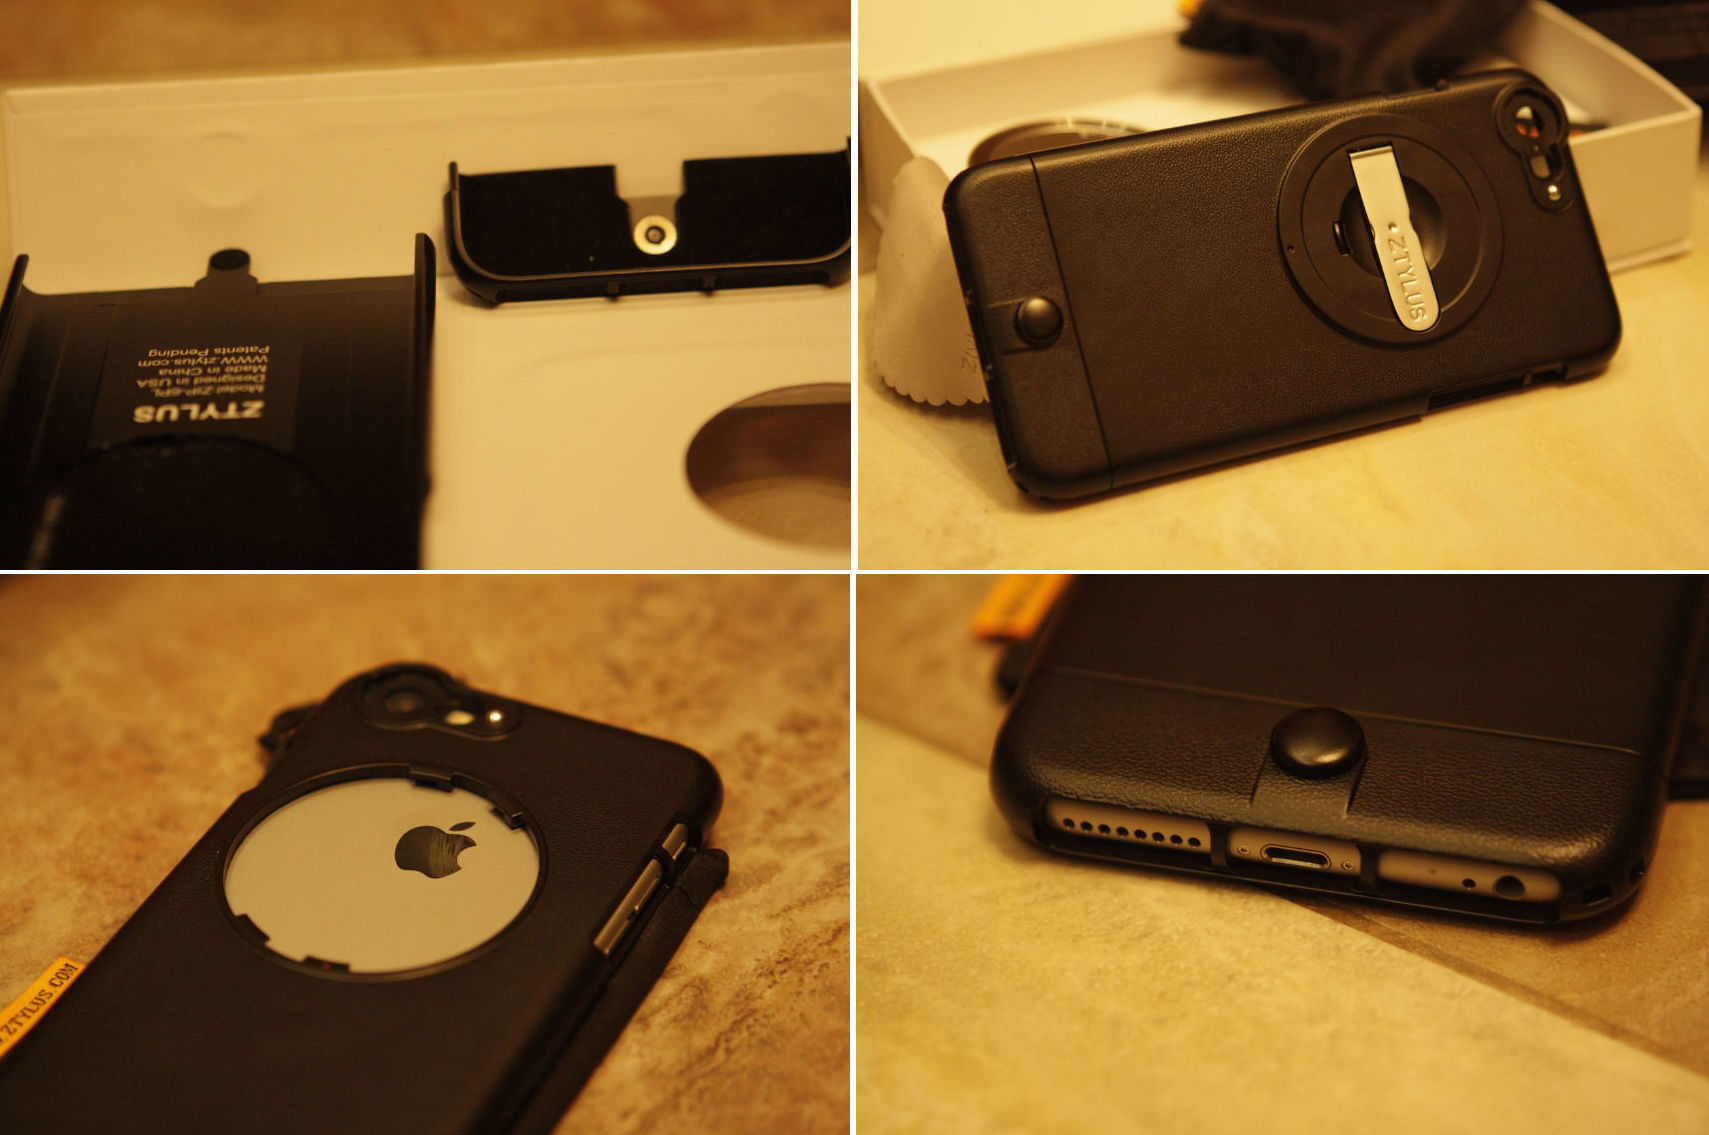 АксCESсуары: чехол для Iphone с набором объективов от ZTYLUS - 5